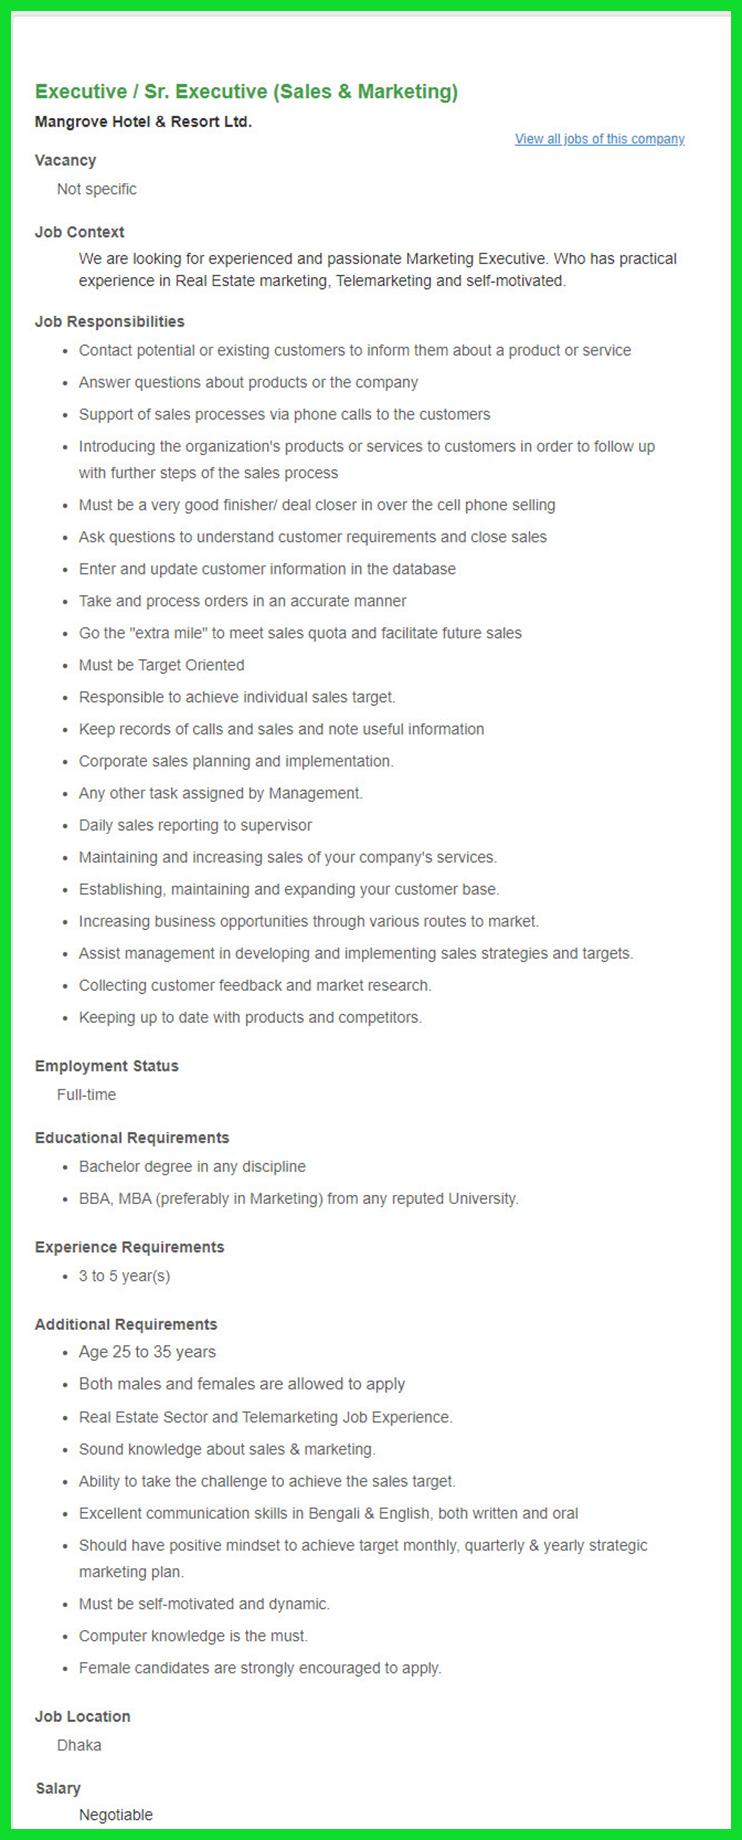 Mangrove Hotel & Resort Ltd Job Circular